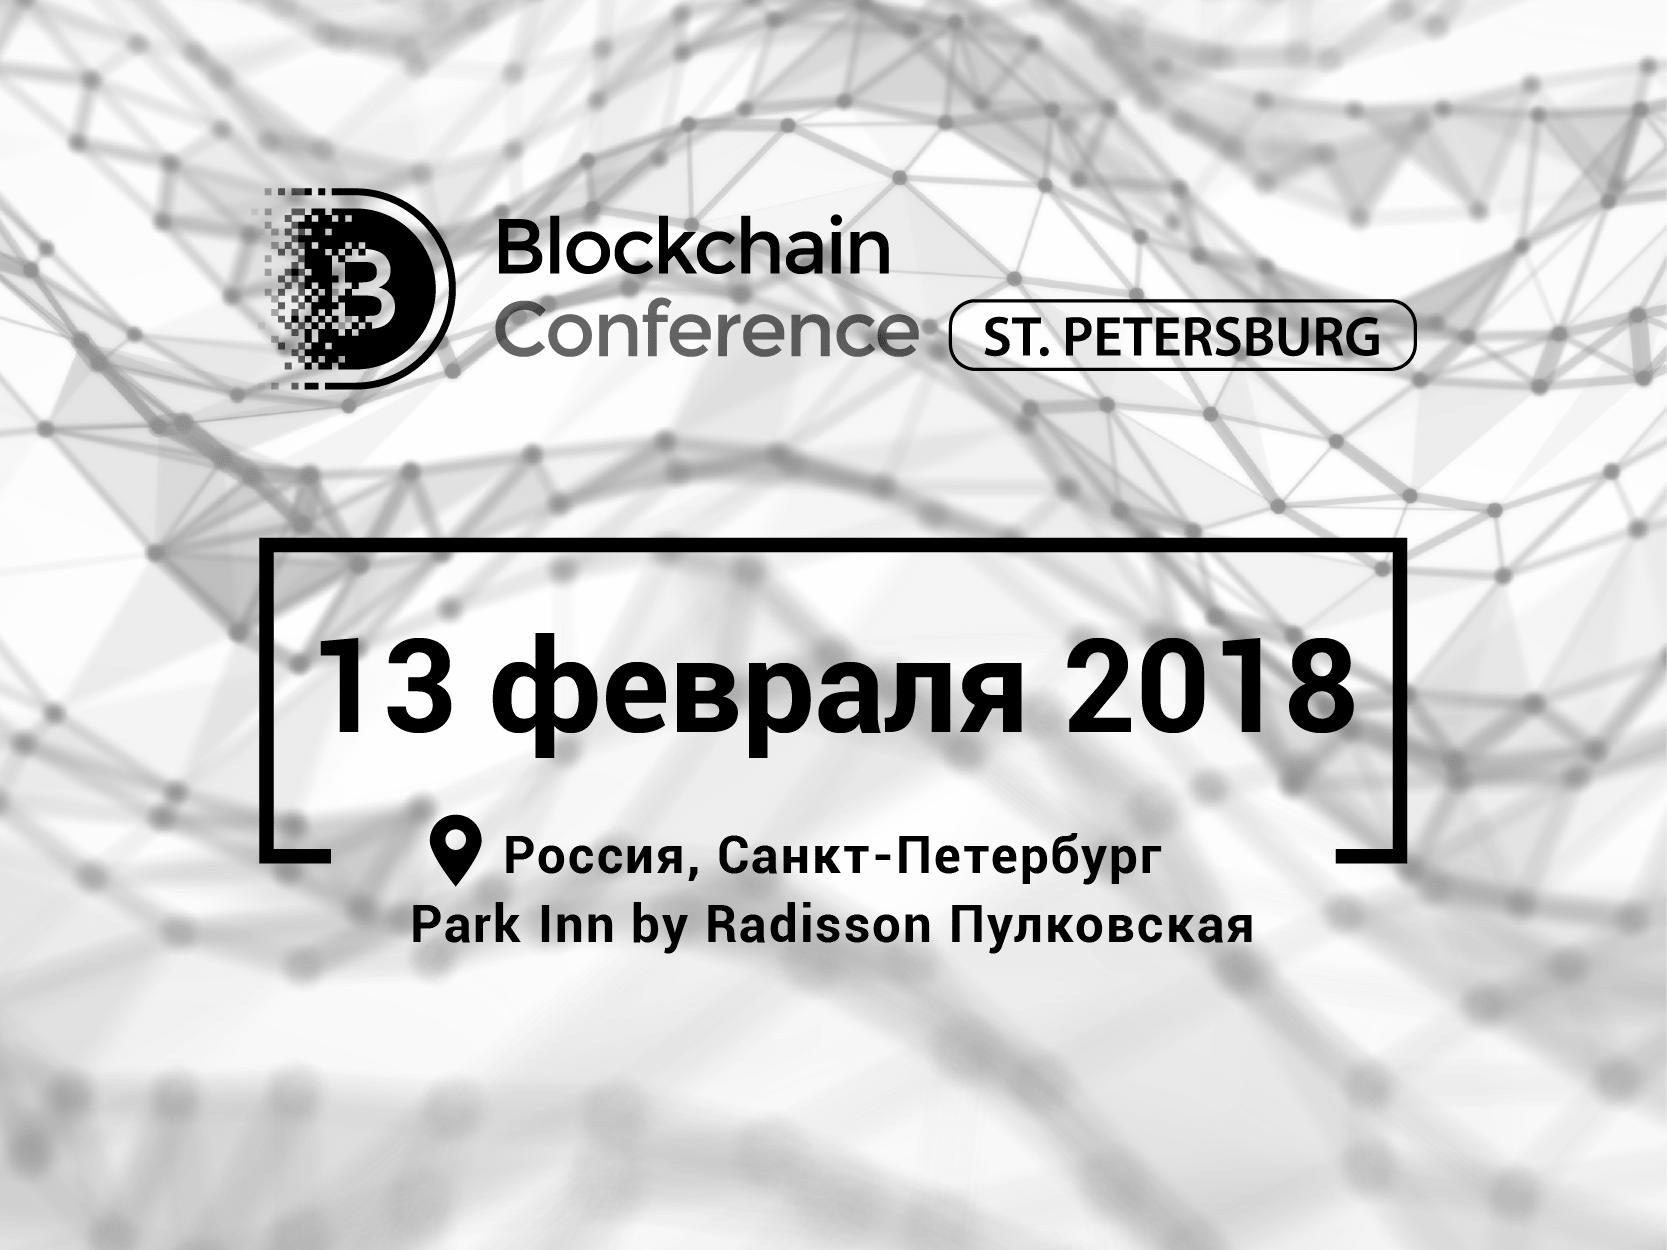 Blockchain Conference St. Petersburg